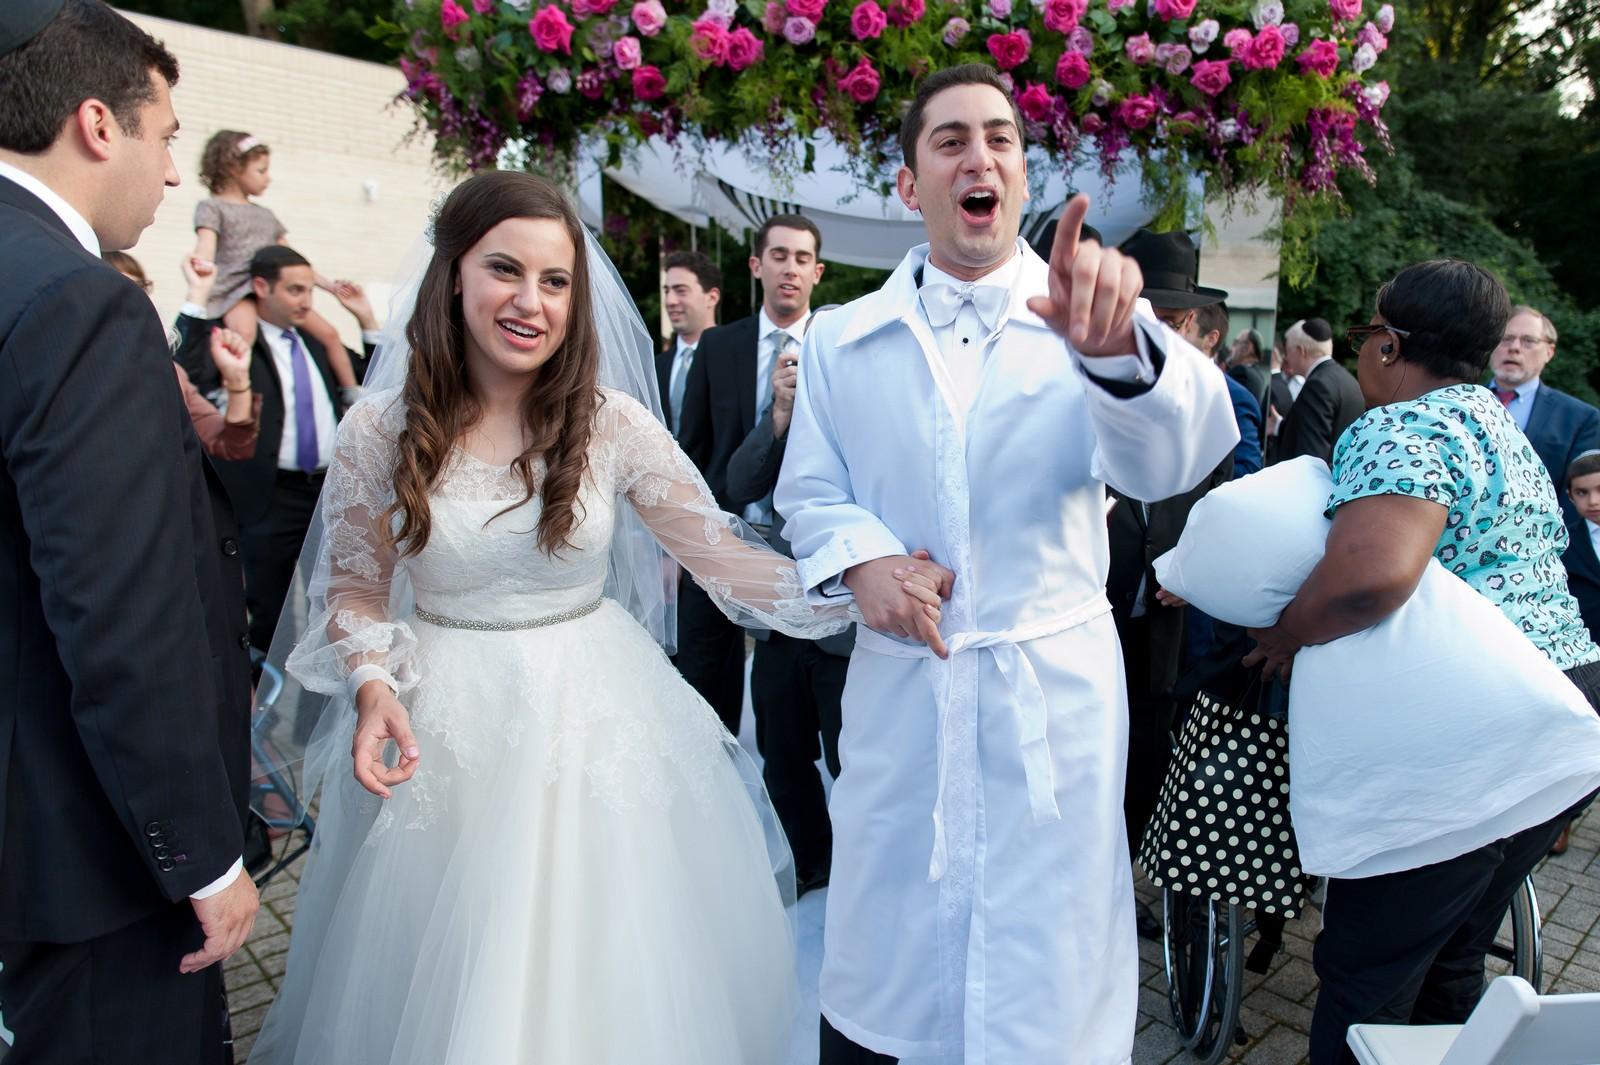 Josh and Michelle's Modern Jewish Wedding at Congregation Keter Torah, Teaneck, New Jersey Photos by Chaim Schvarcz, Chuppah, Bride, Groom